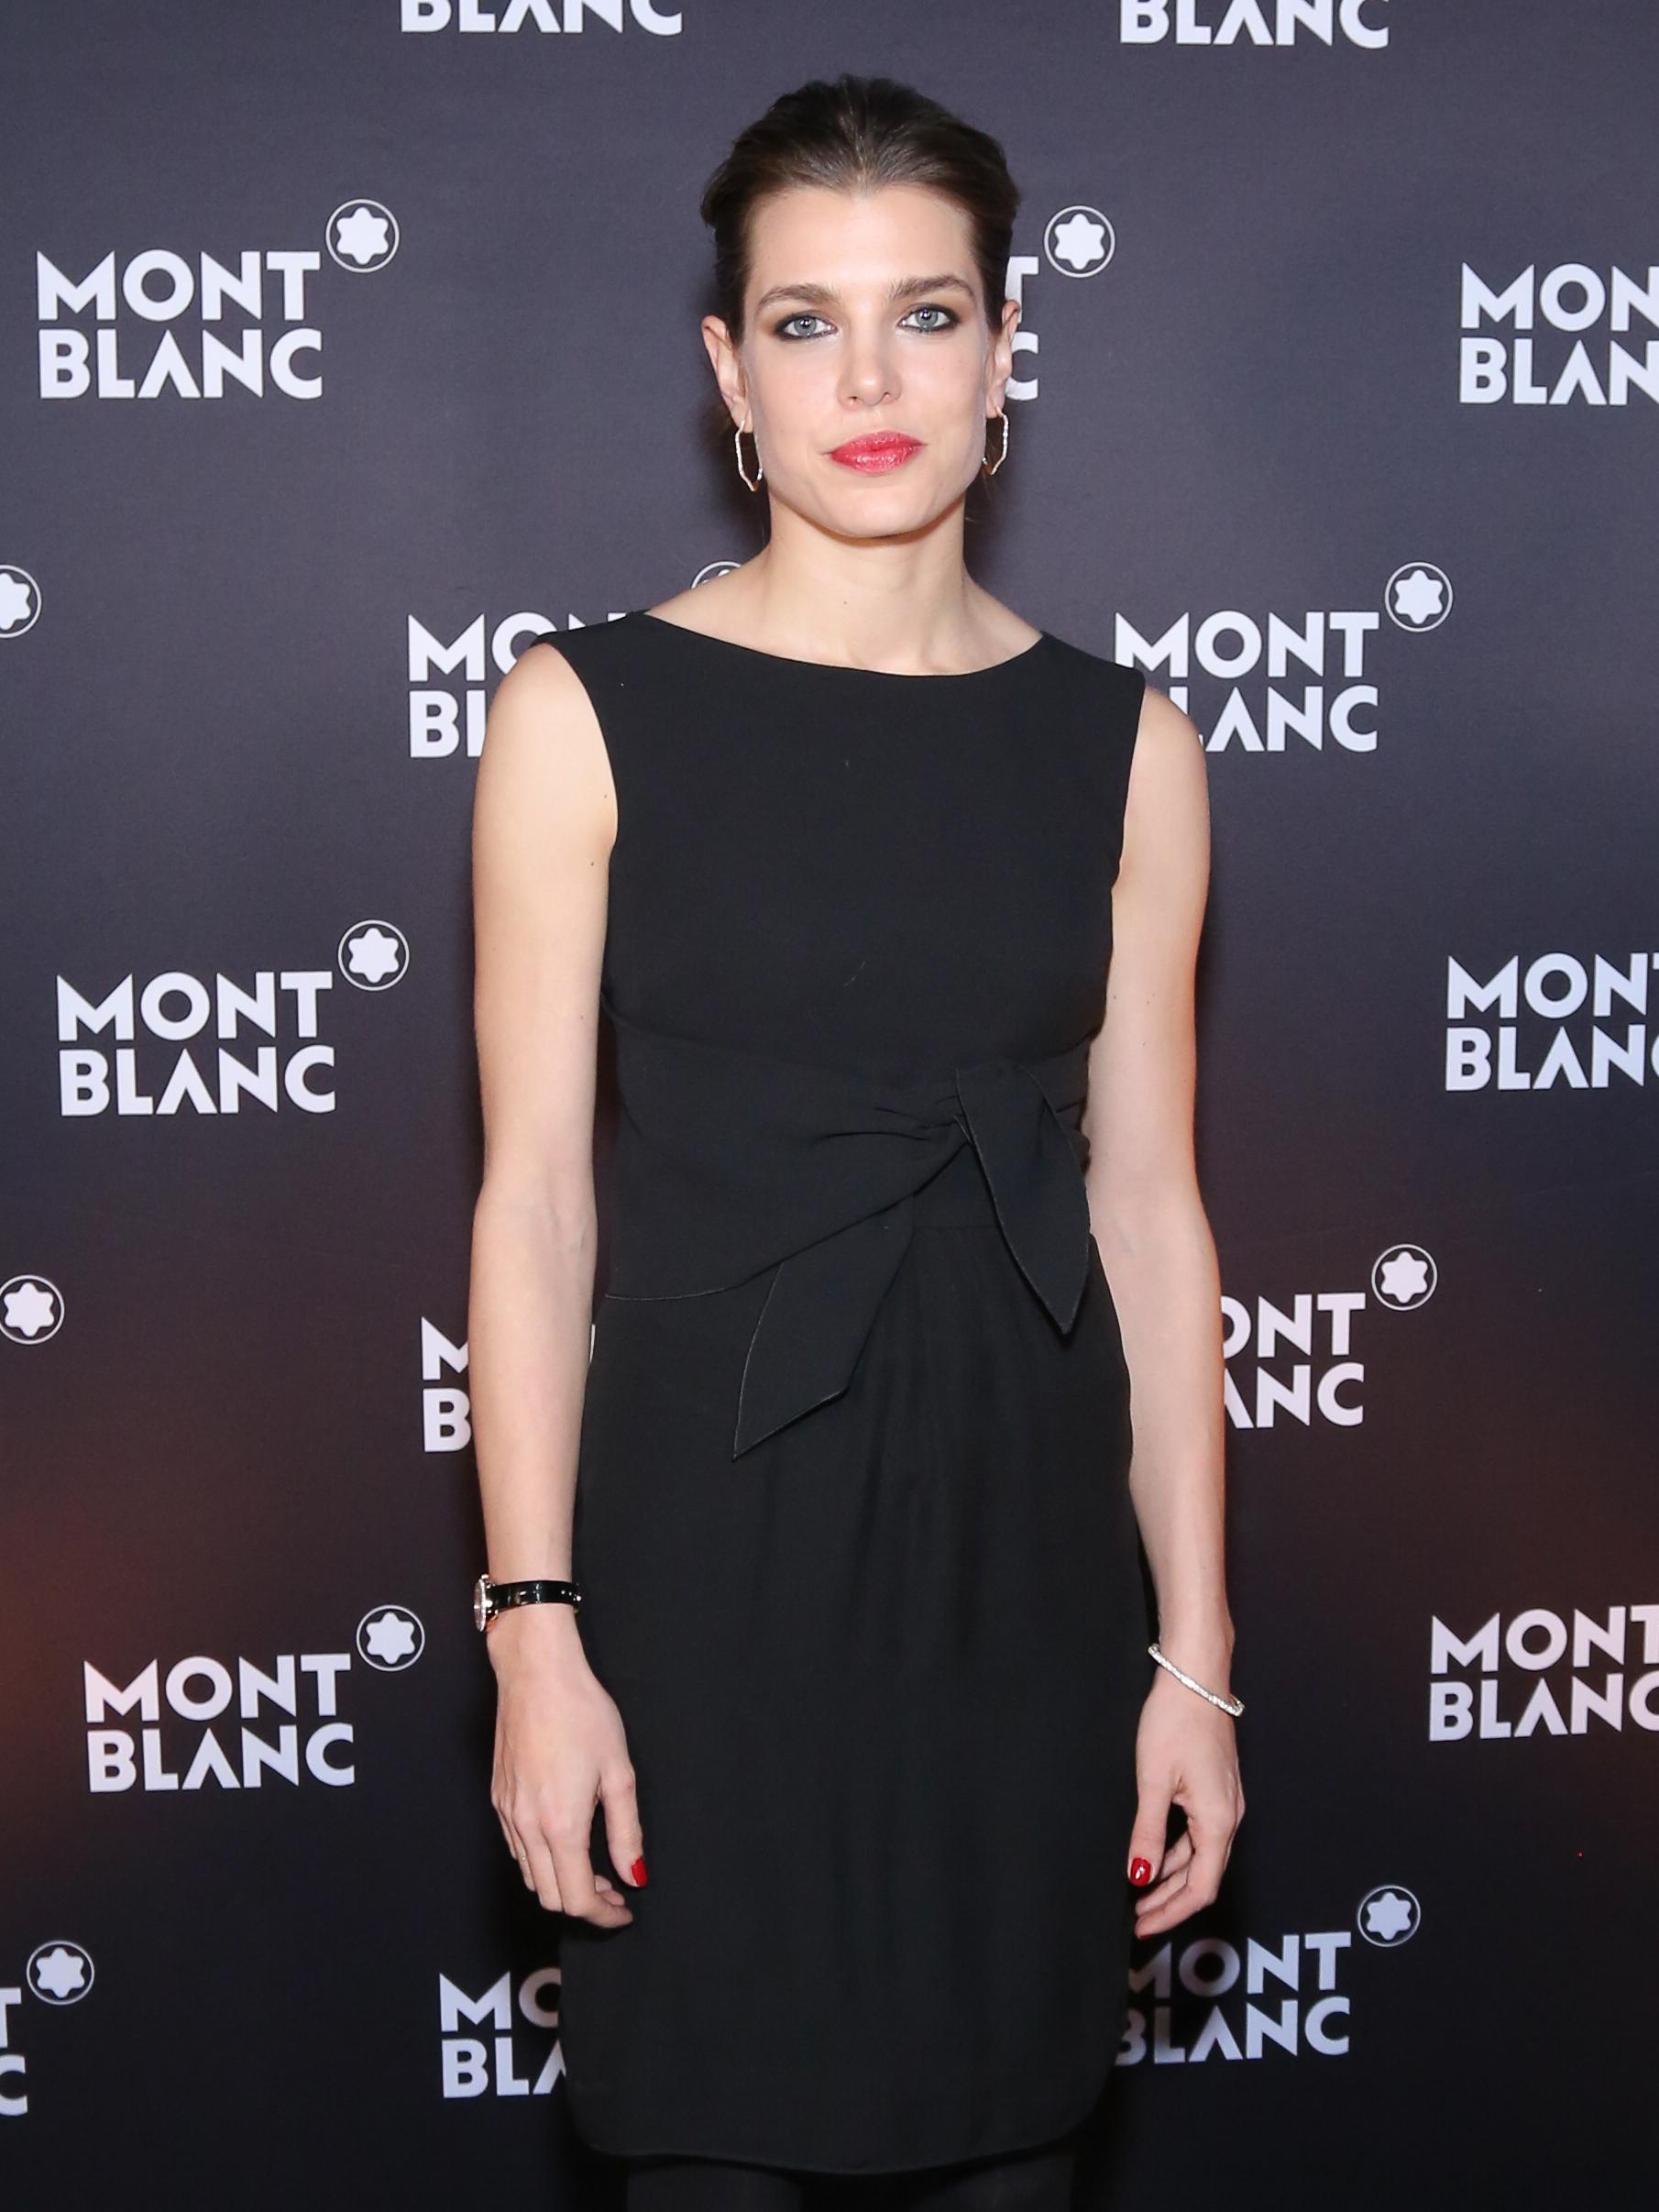 Charlotte Casiraghi ambasciatrice Montblanc